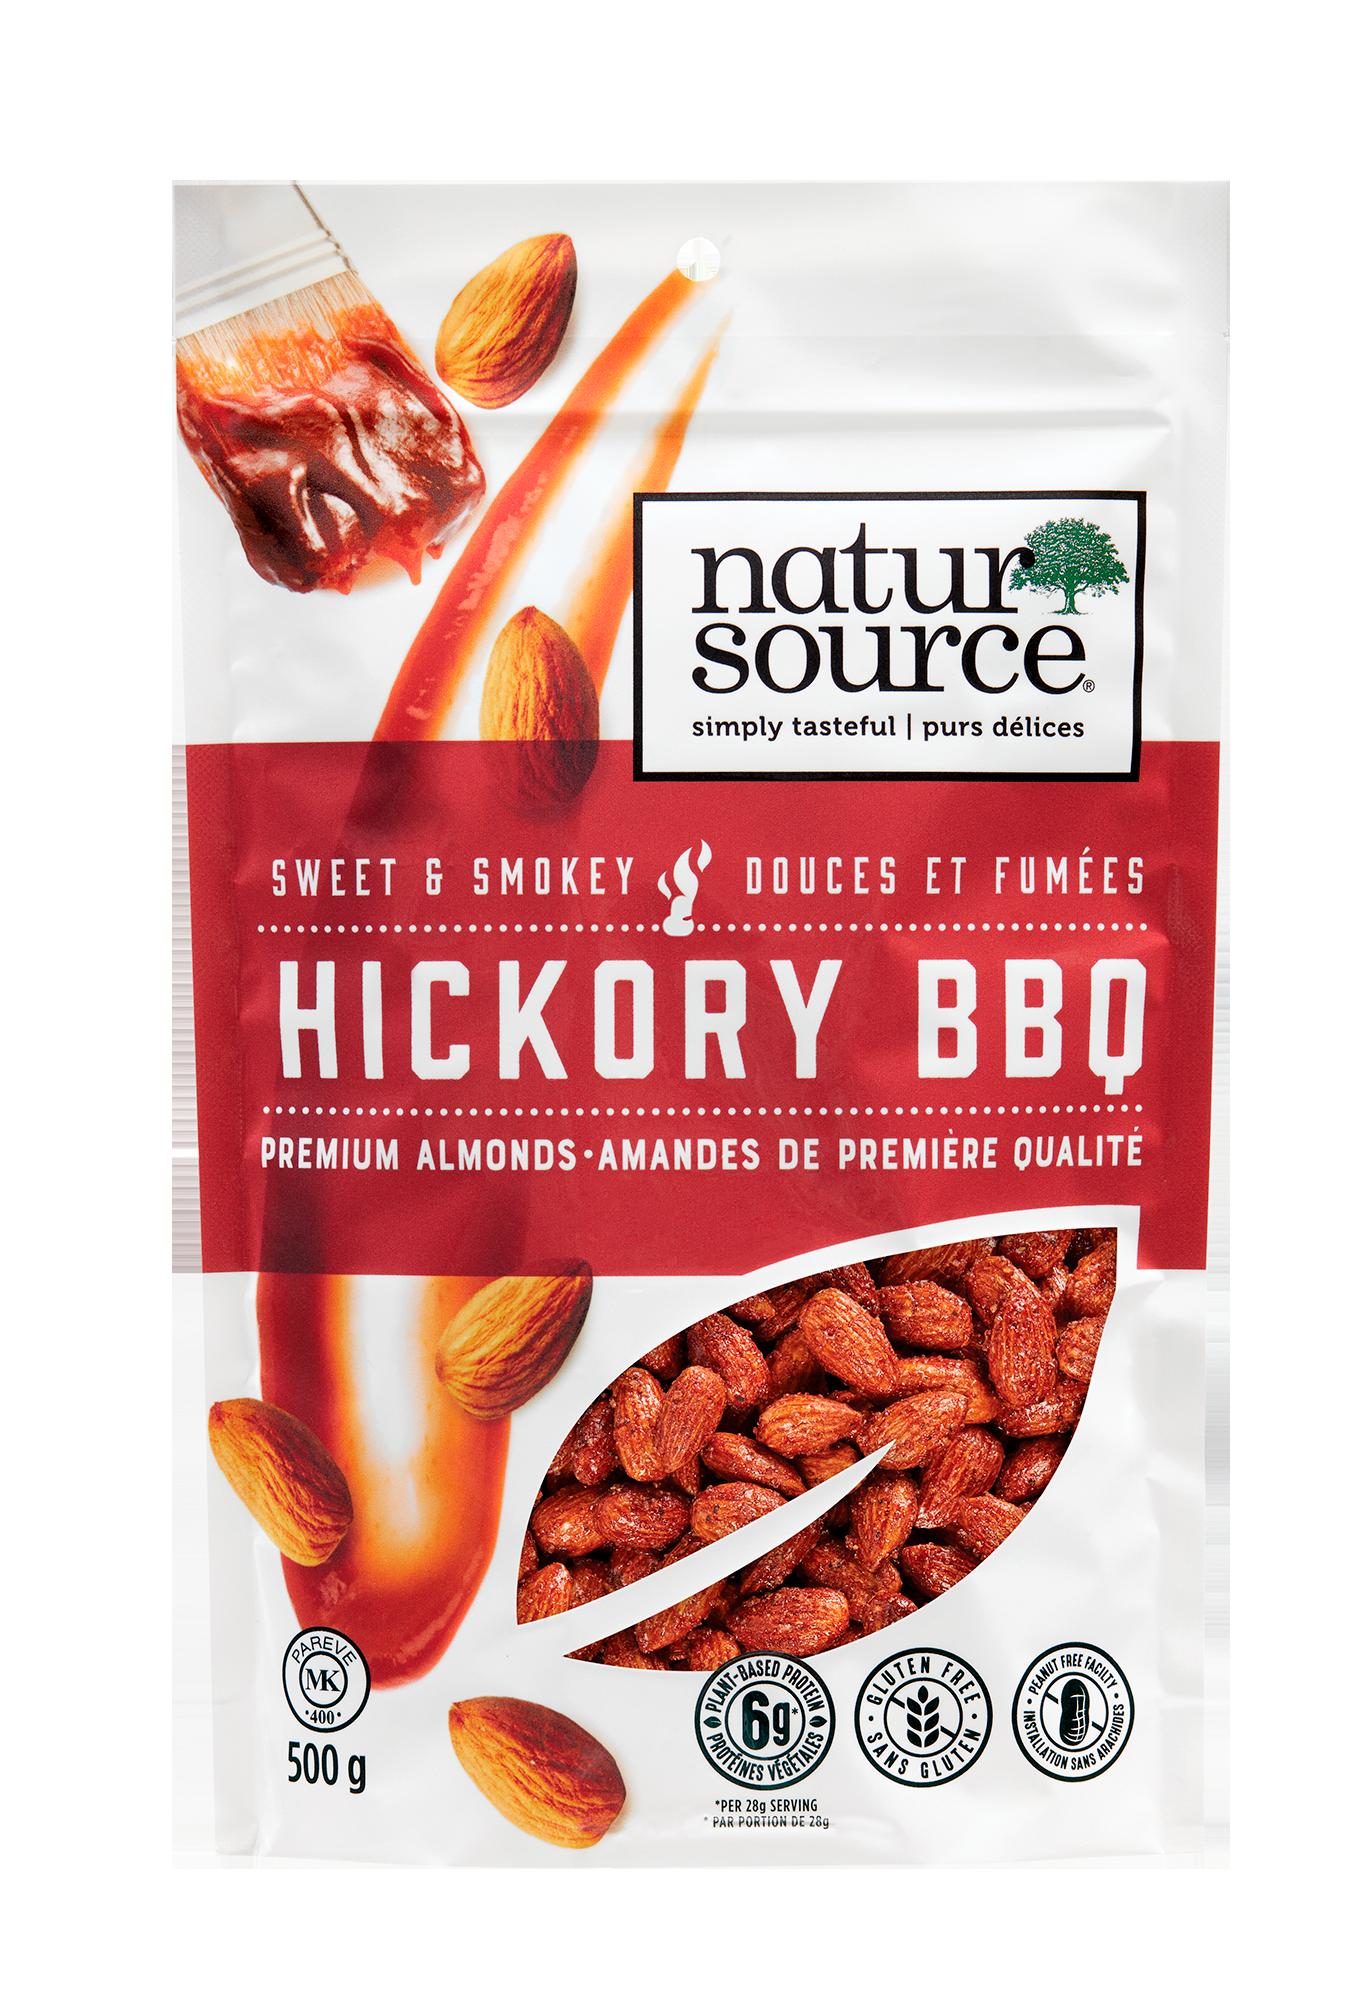 natursource sweet and smokey Hickory Barbecue premium almonds